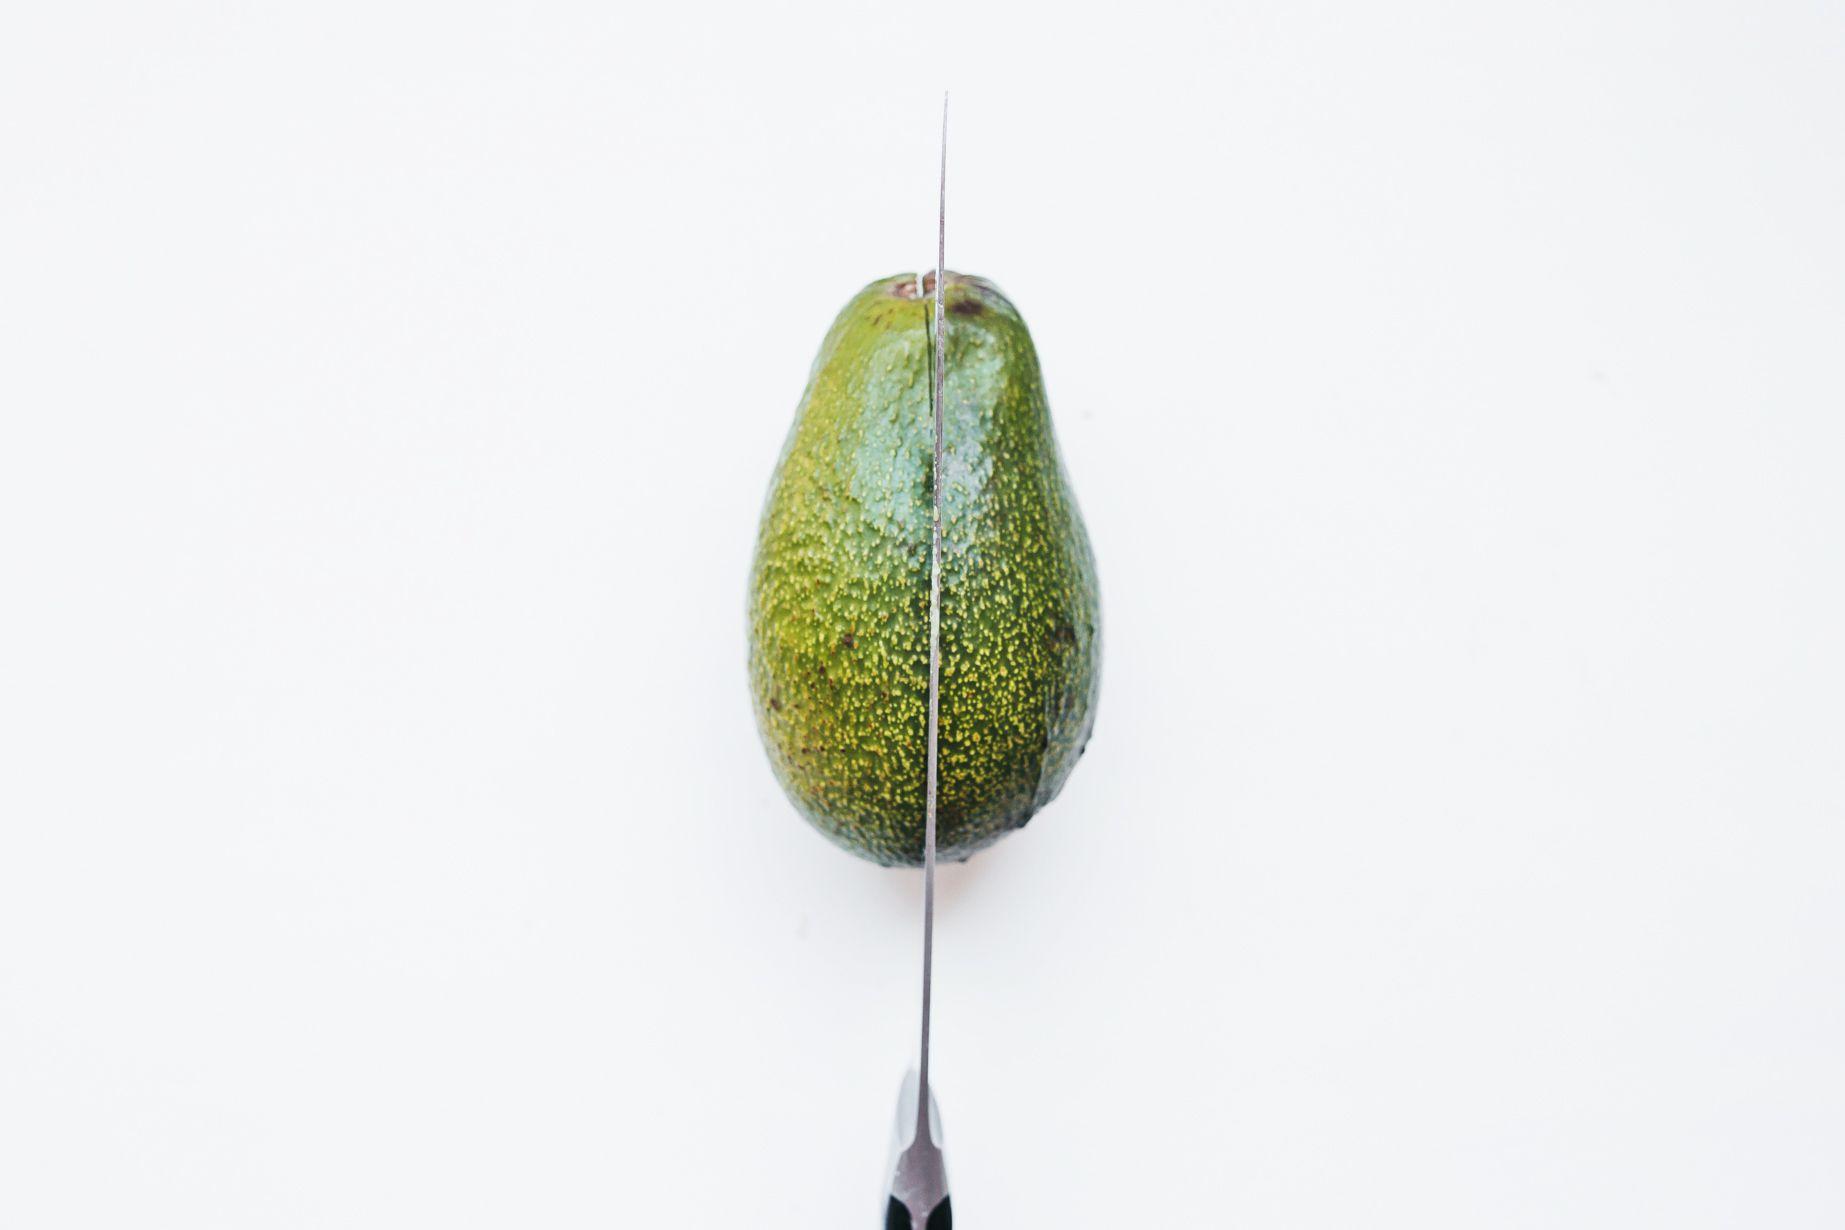 Cut the avocado